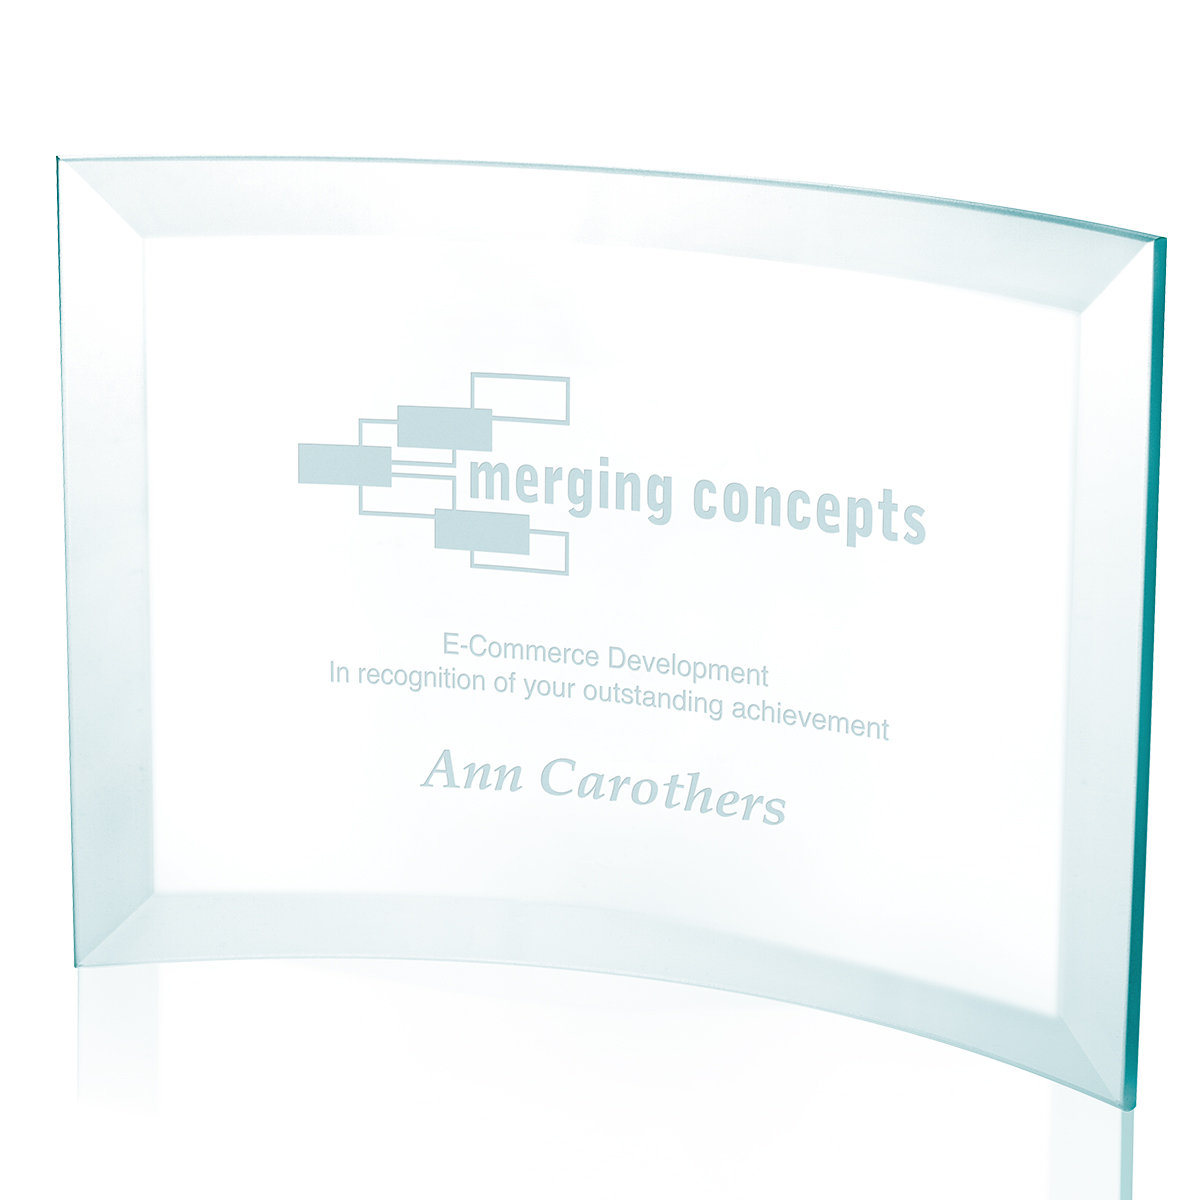 Jaffa Small Jade Crystal Scroll Award - Deep Etch Imprint, #35254